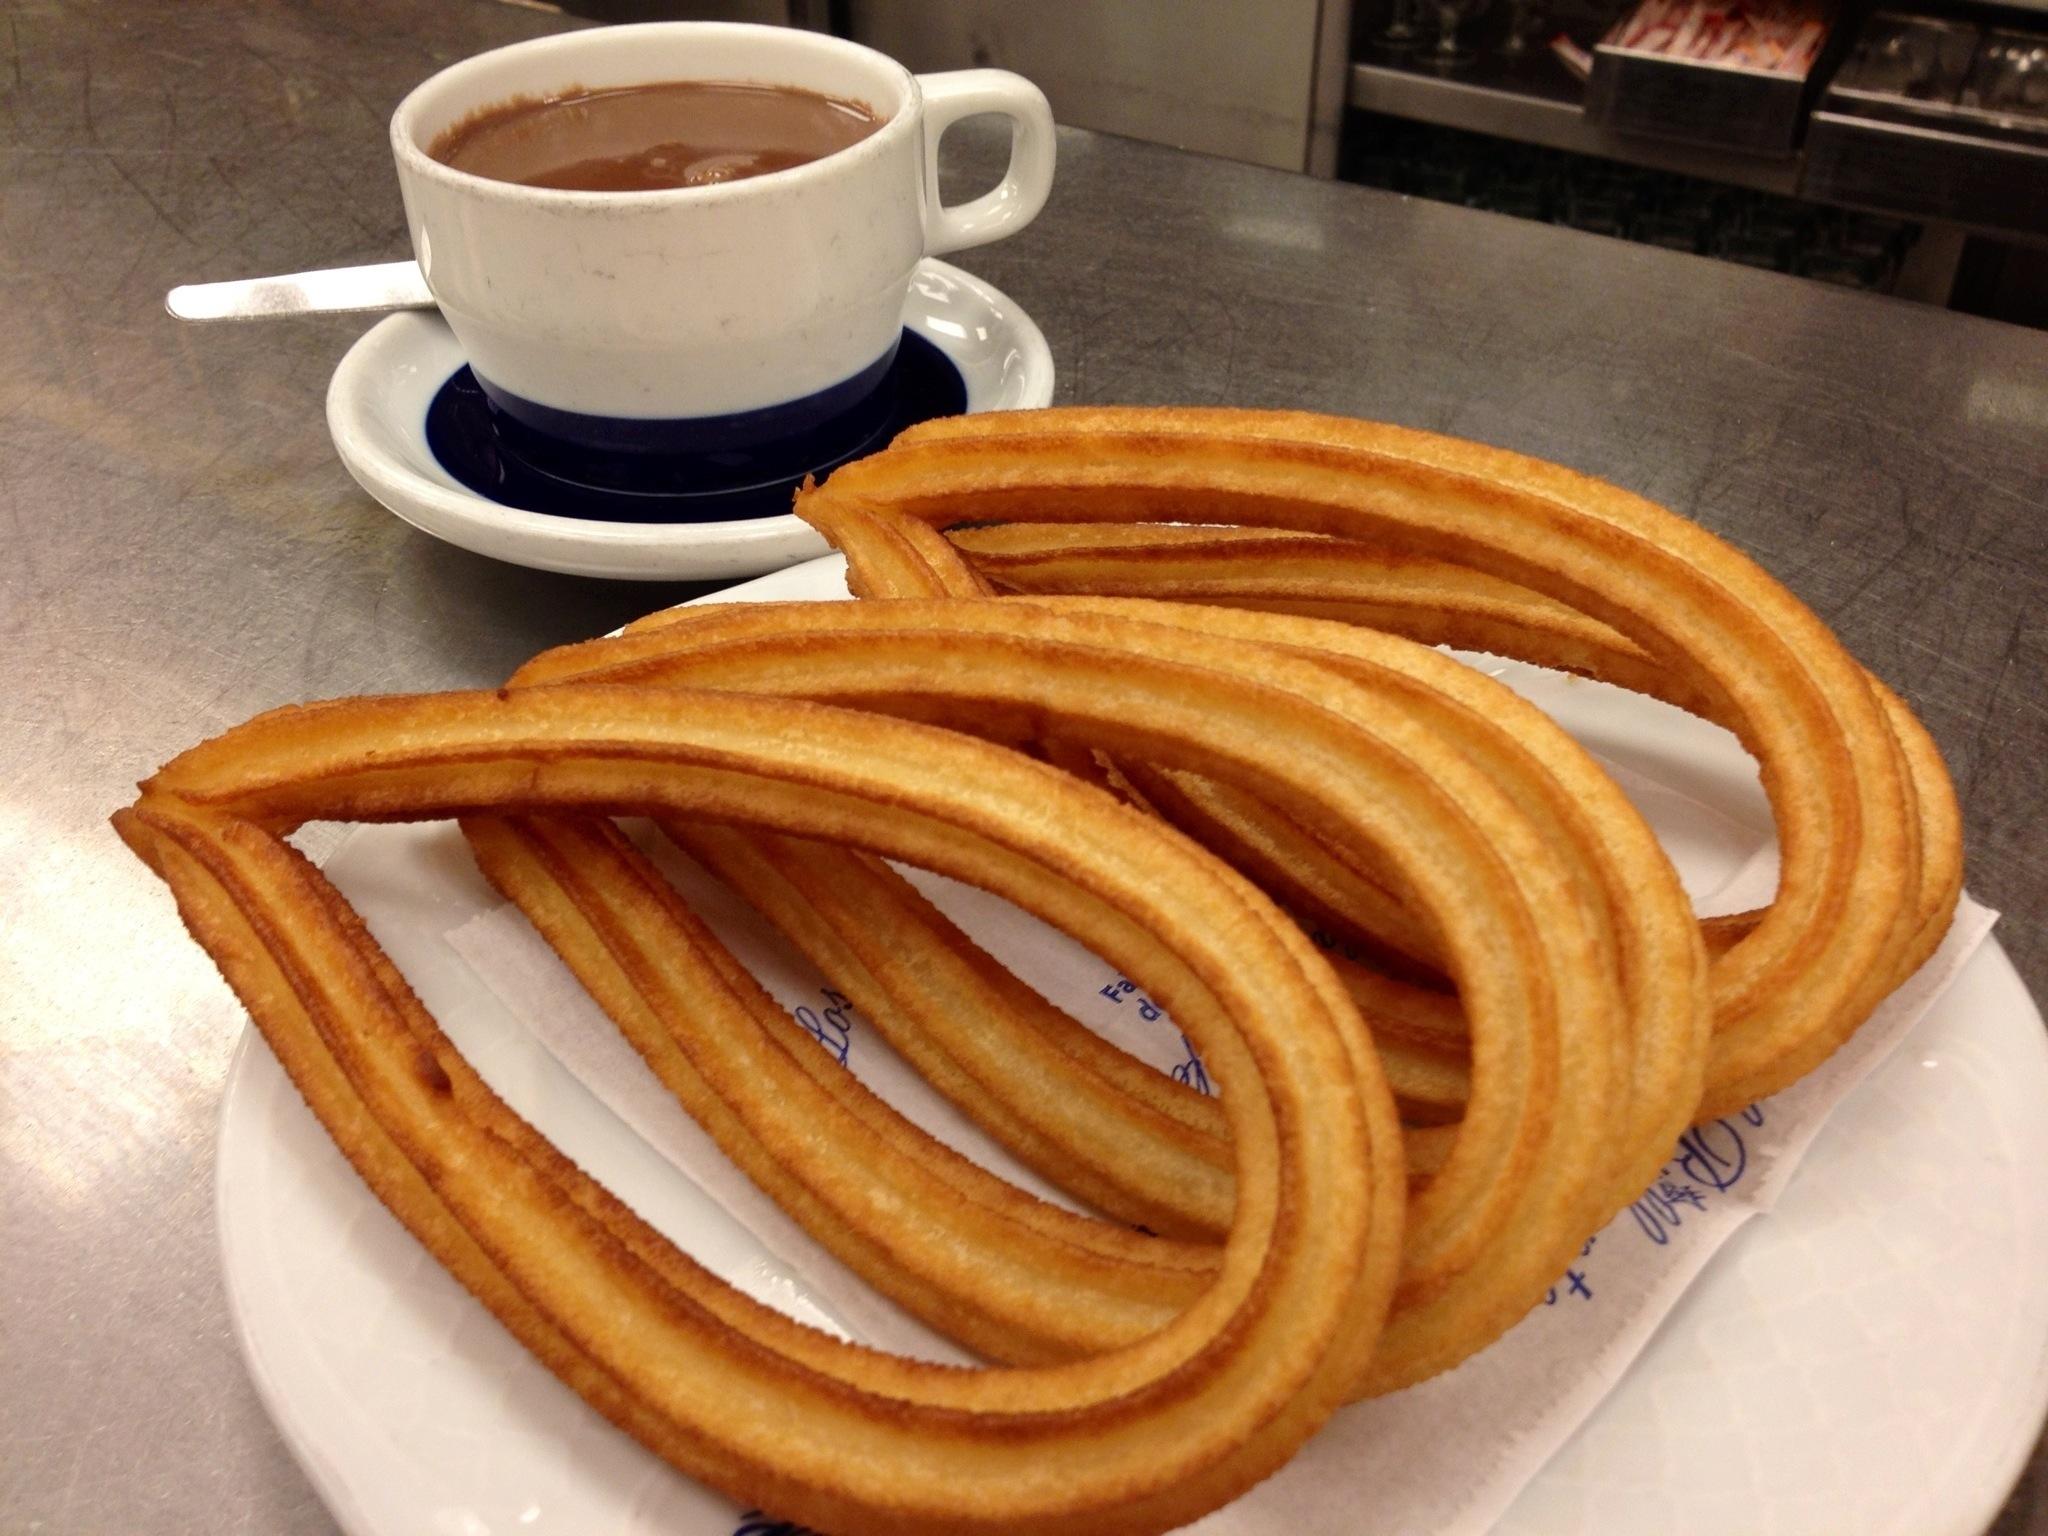 File:Chocolate con churros de lazo.jpg - Wikimedia Commons